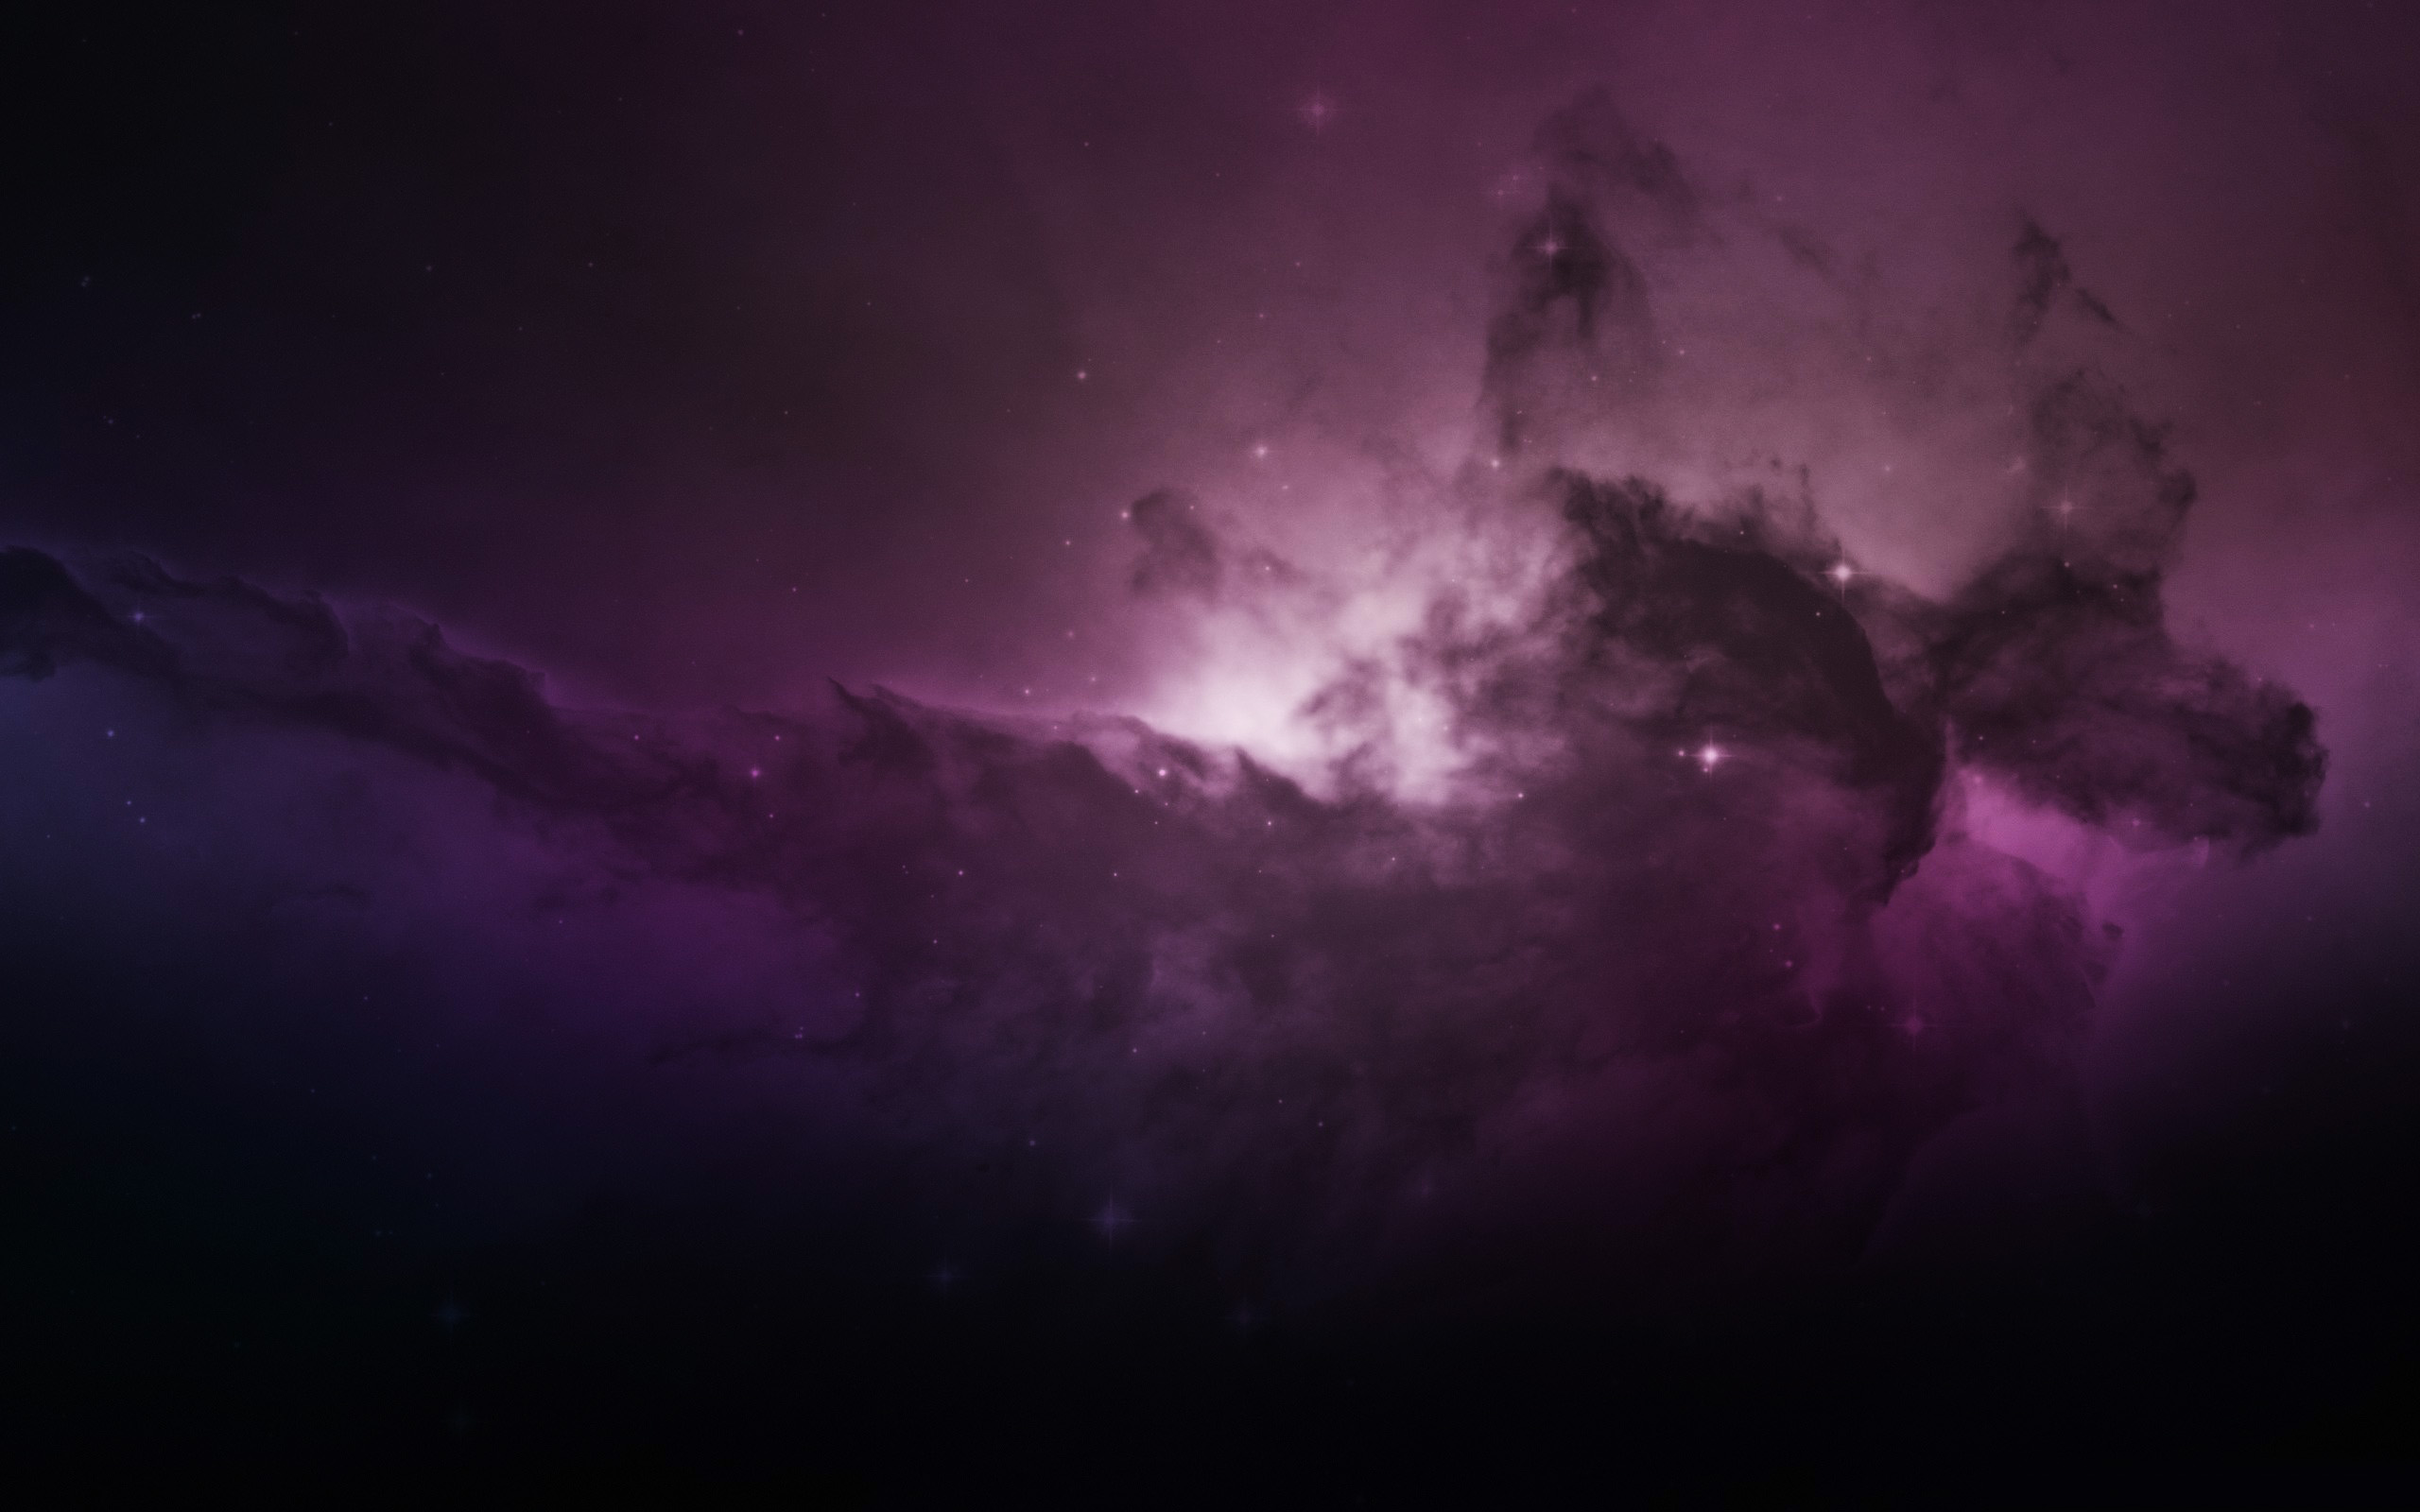 Nebula Space Stars Wallpaper   Pics about space 2560x1600